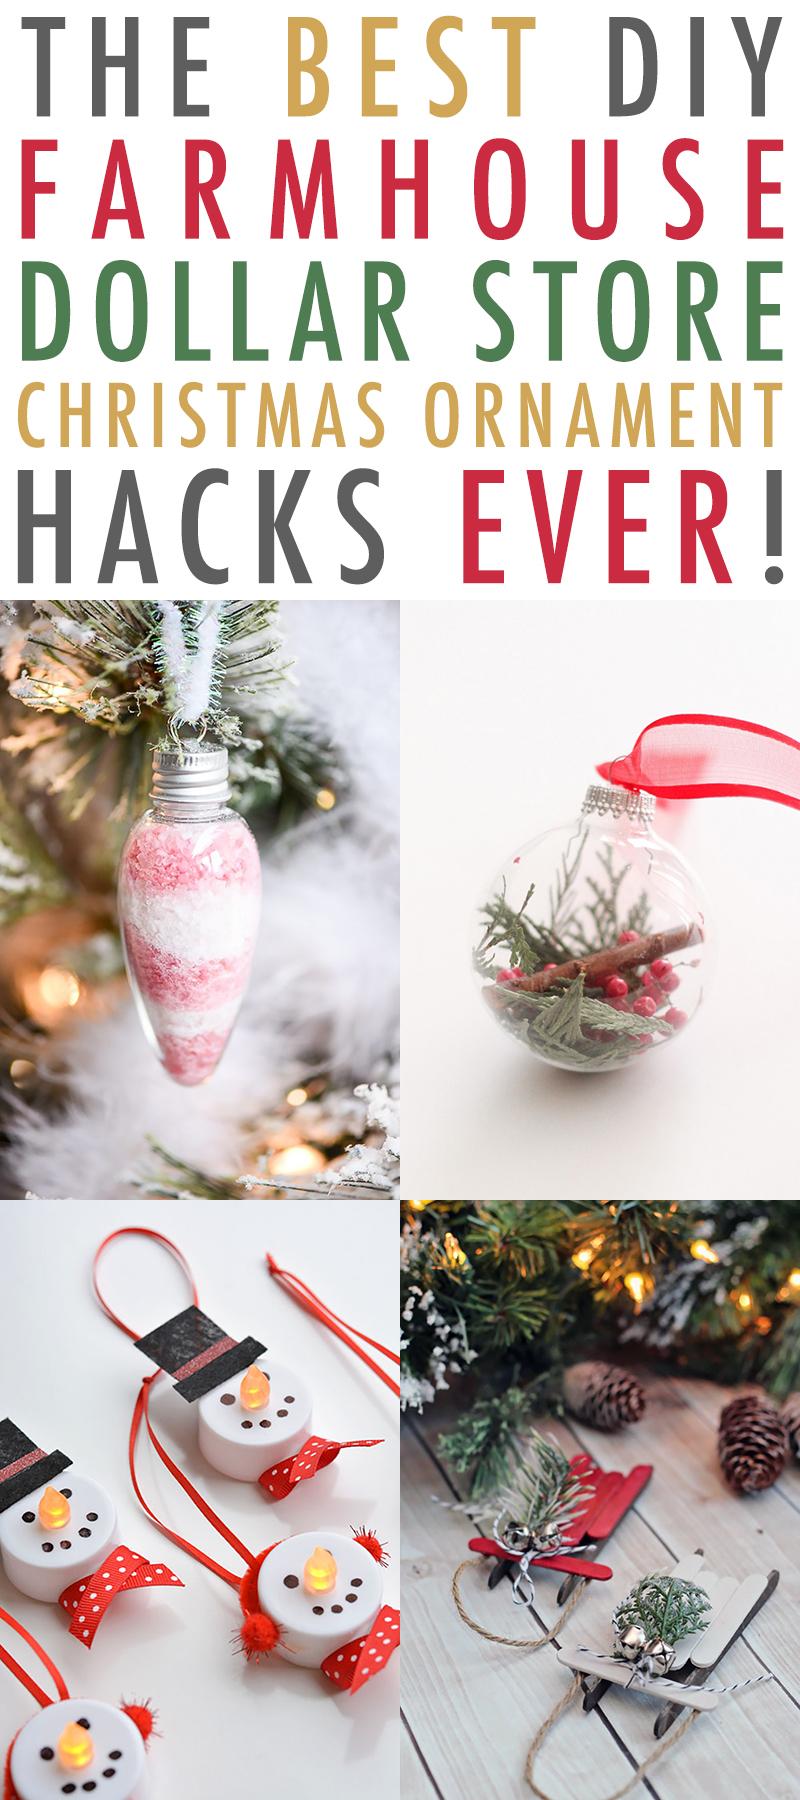 The Best Diy Dollar Store Christmas Ornament Hacks Ever